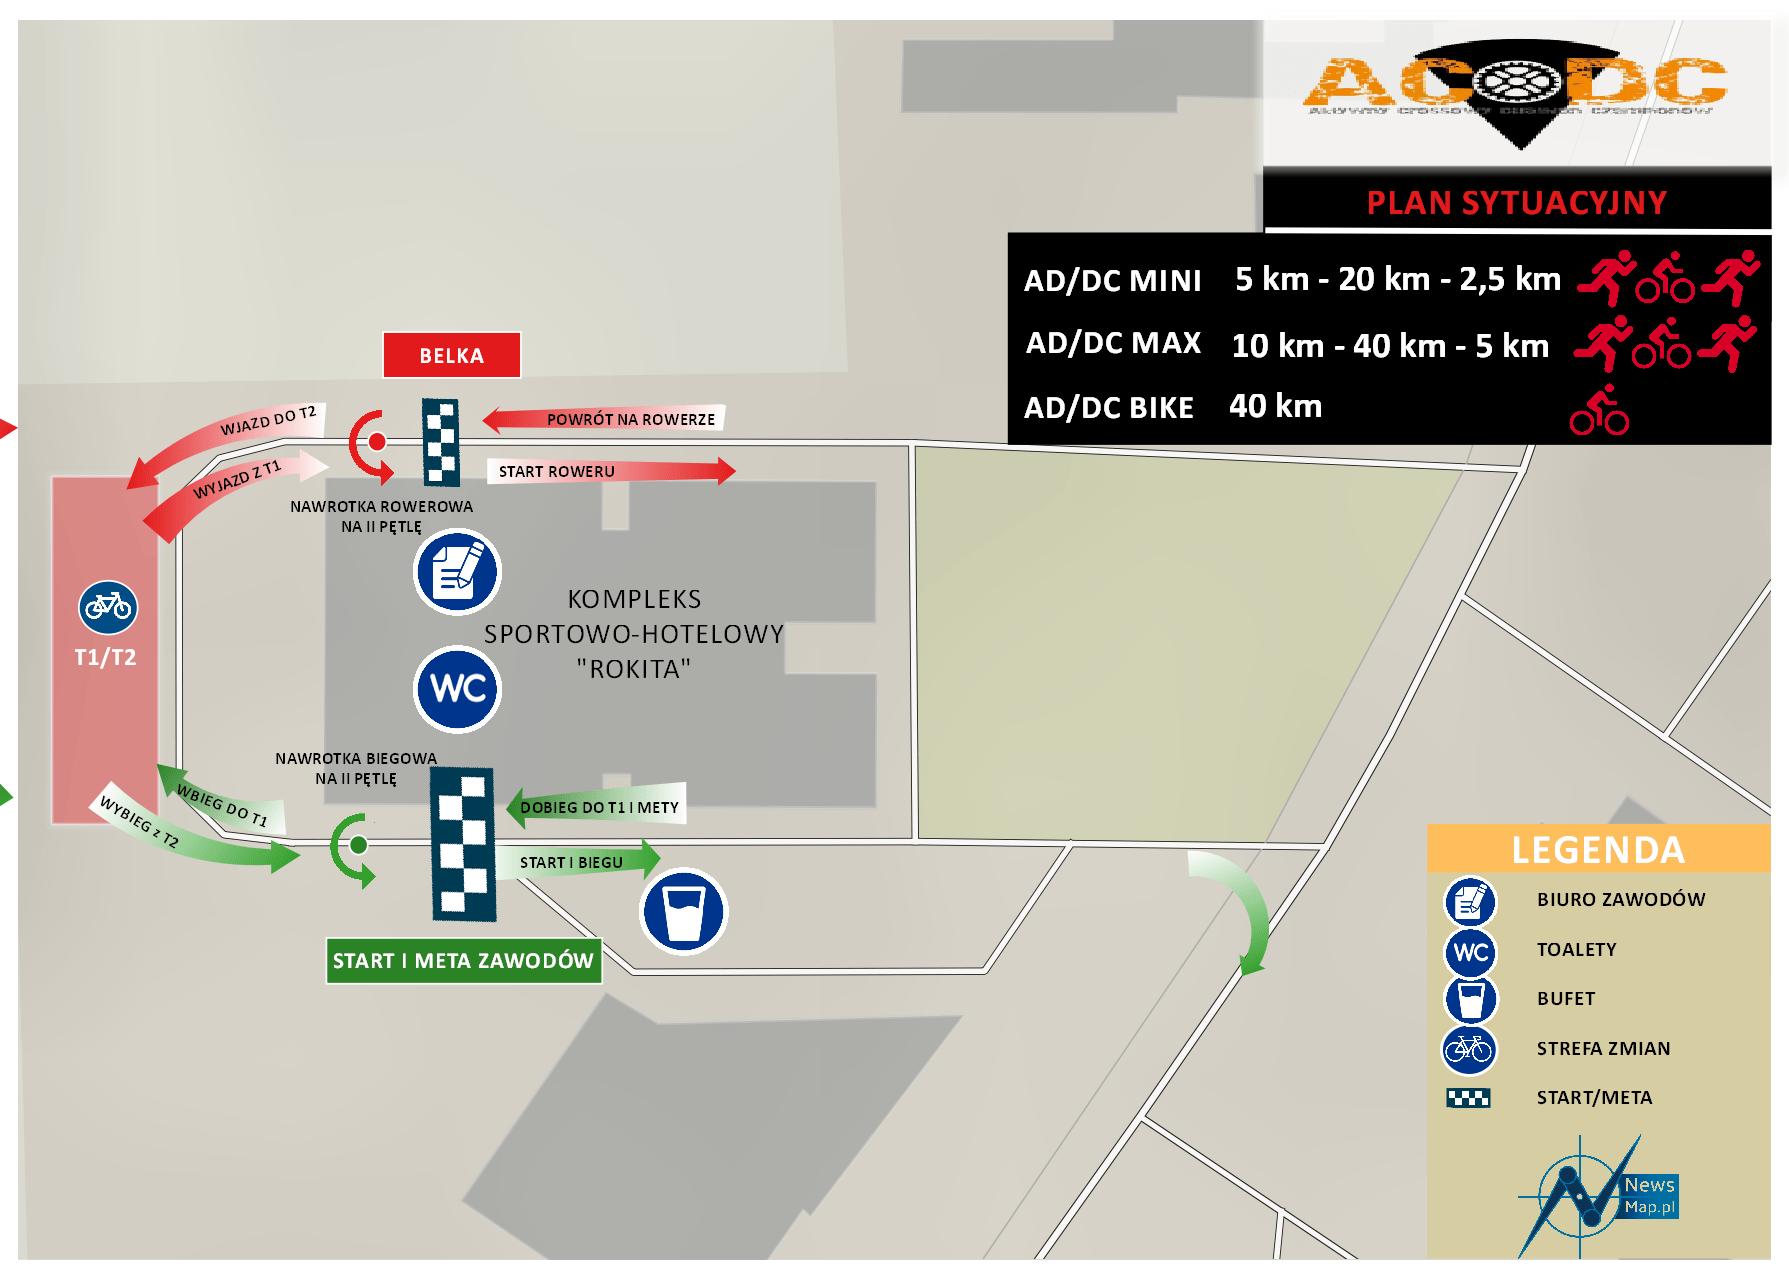 Duathlon AD;DC - plan sytuacyjny (mapa on-line)